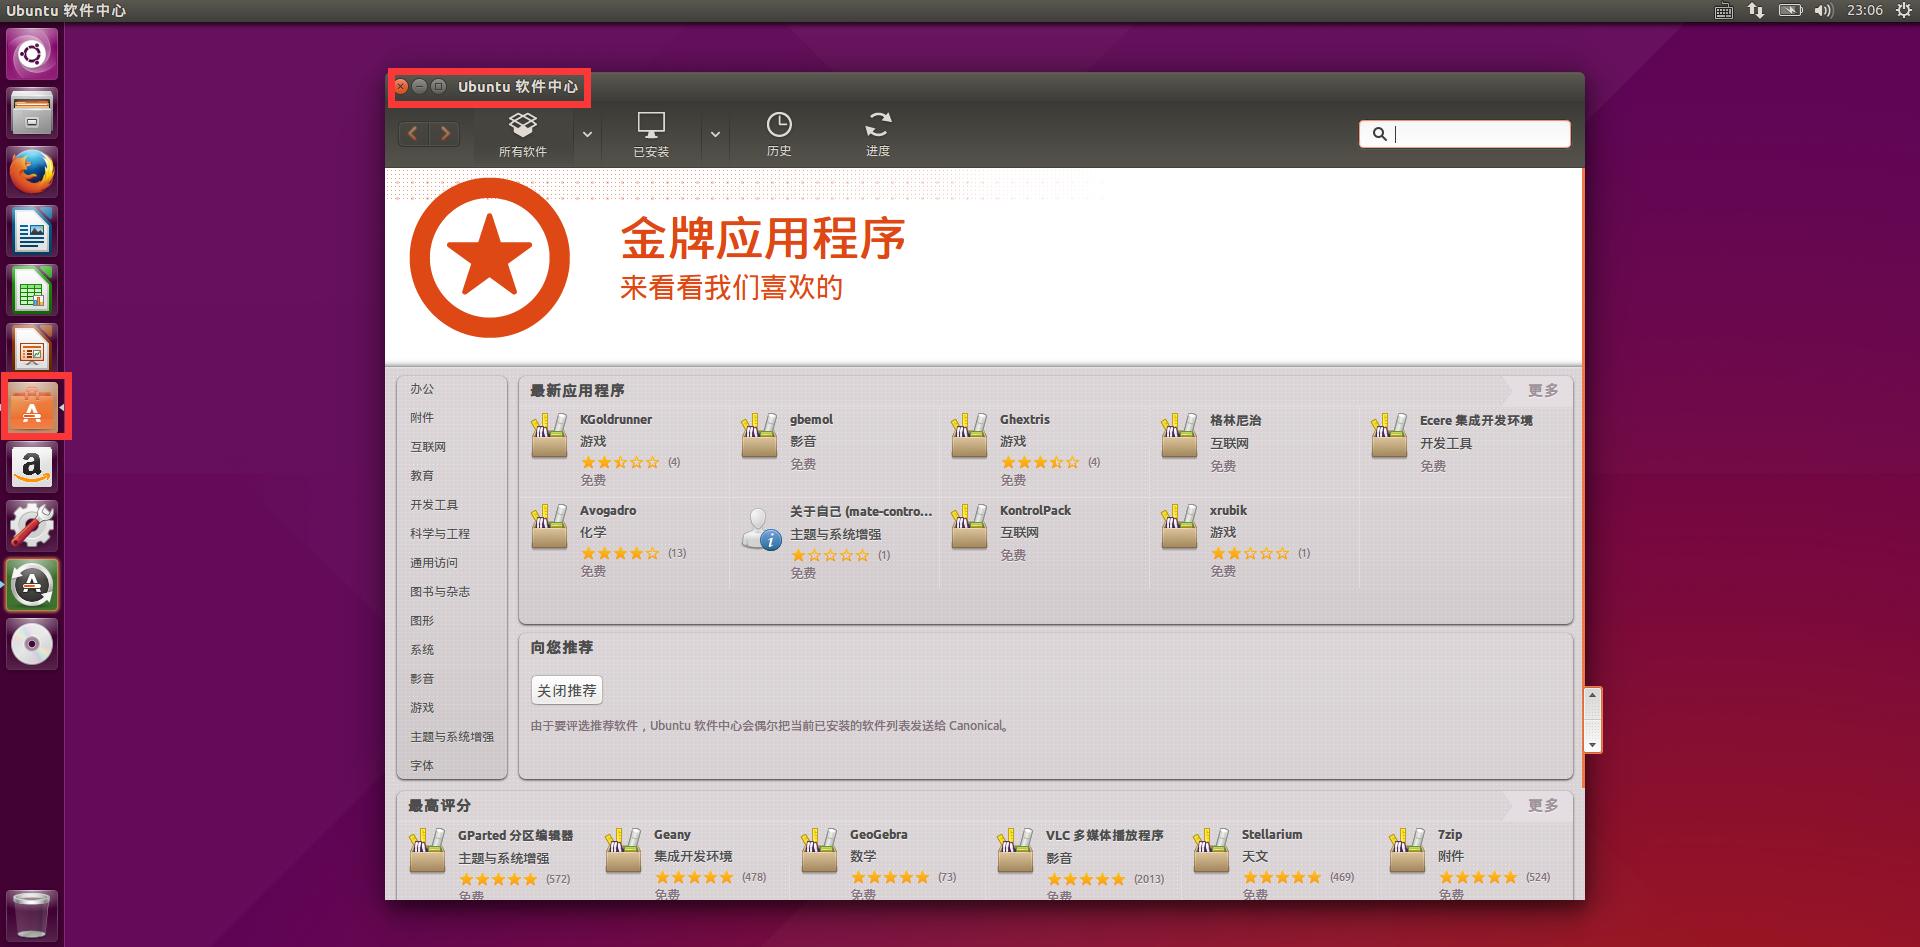 Ubunutu 软件中心